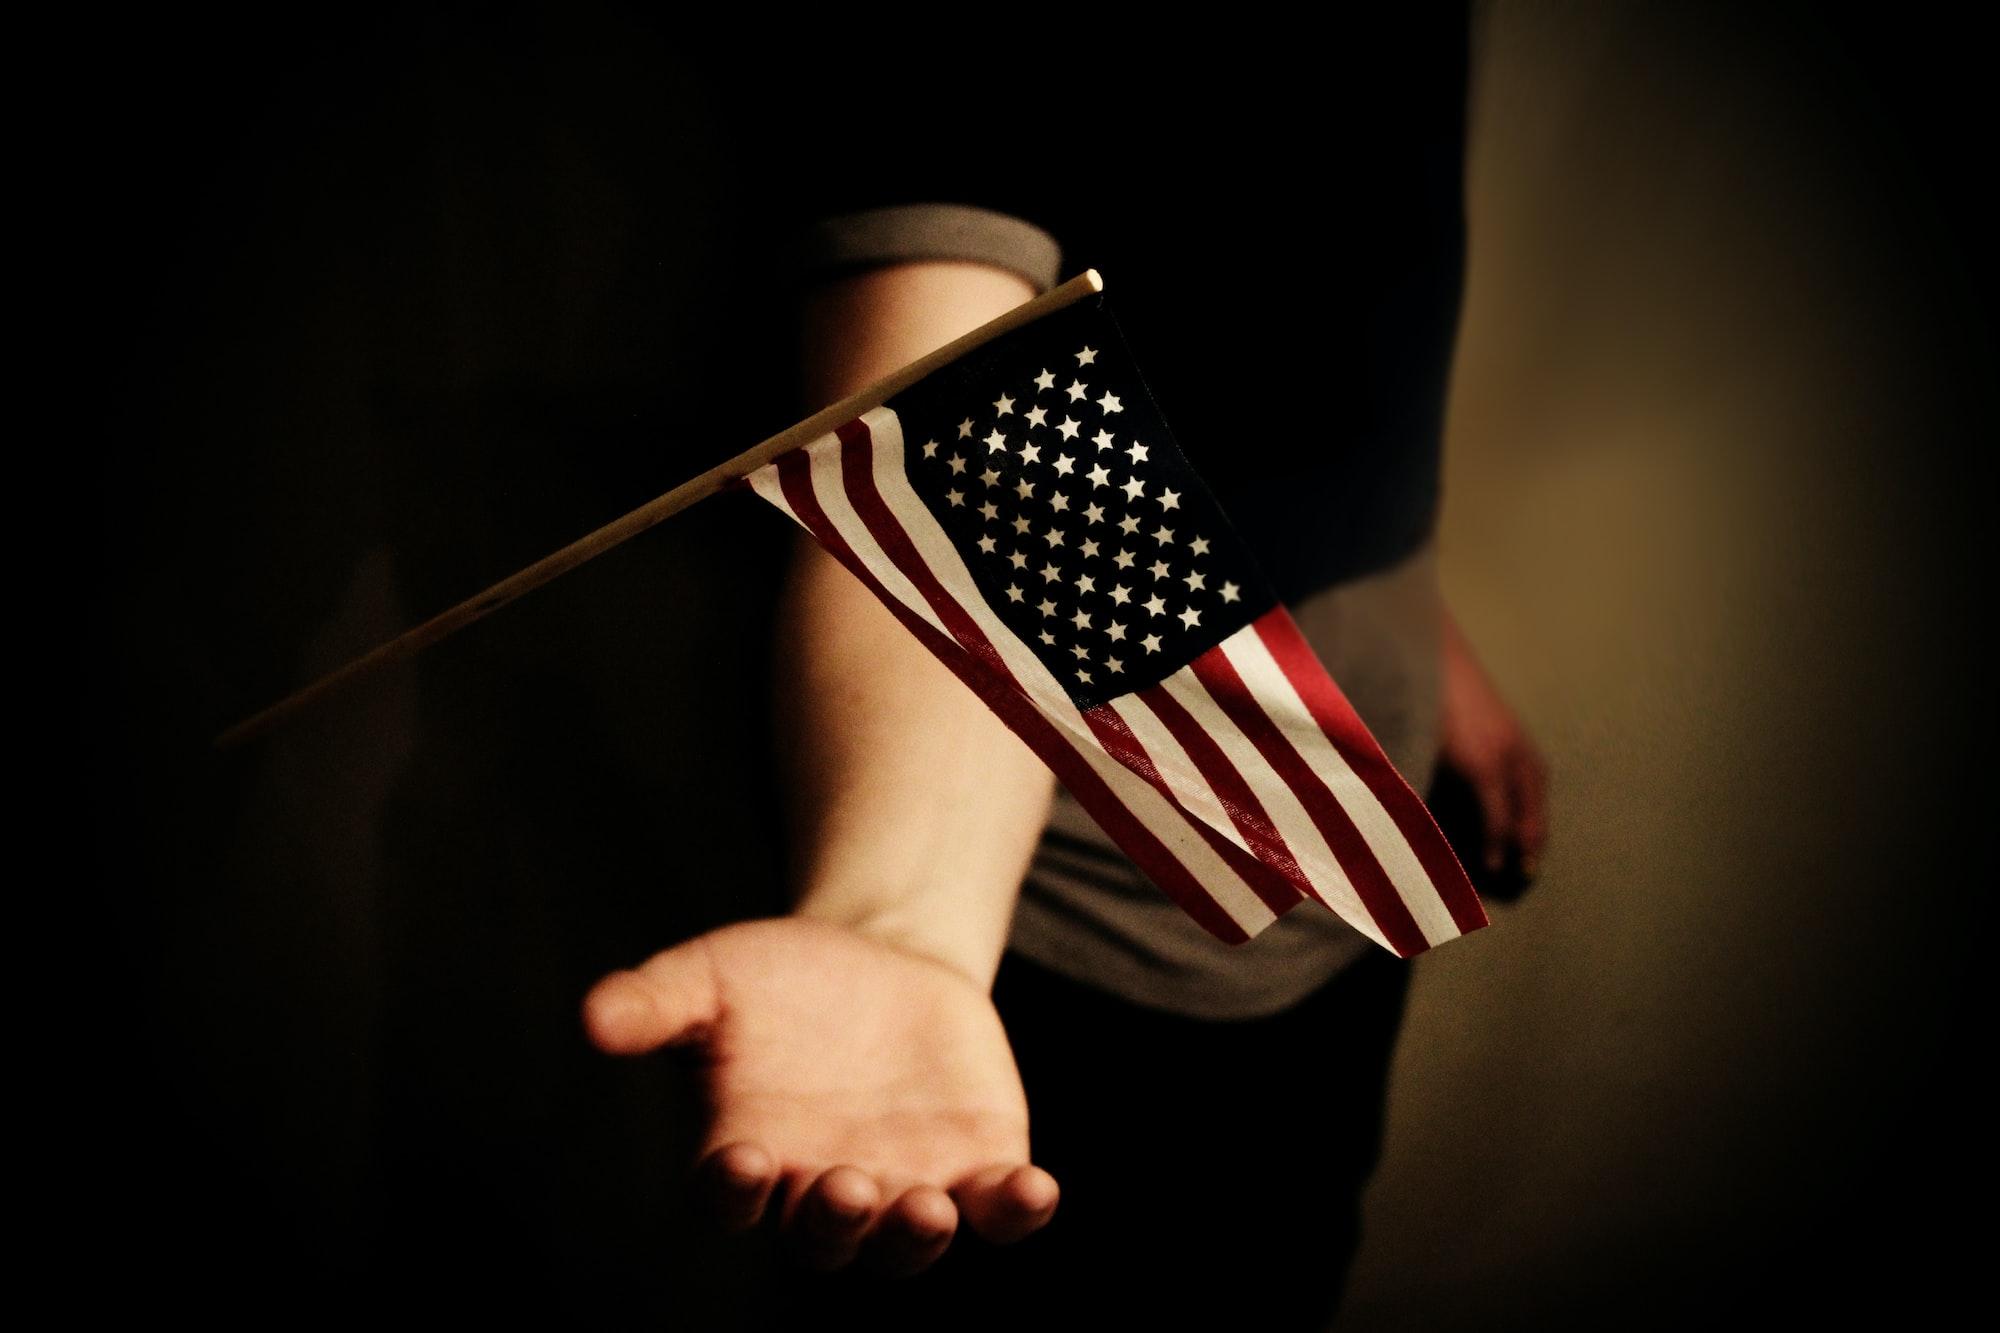 Holding America